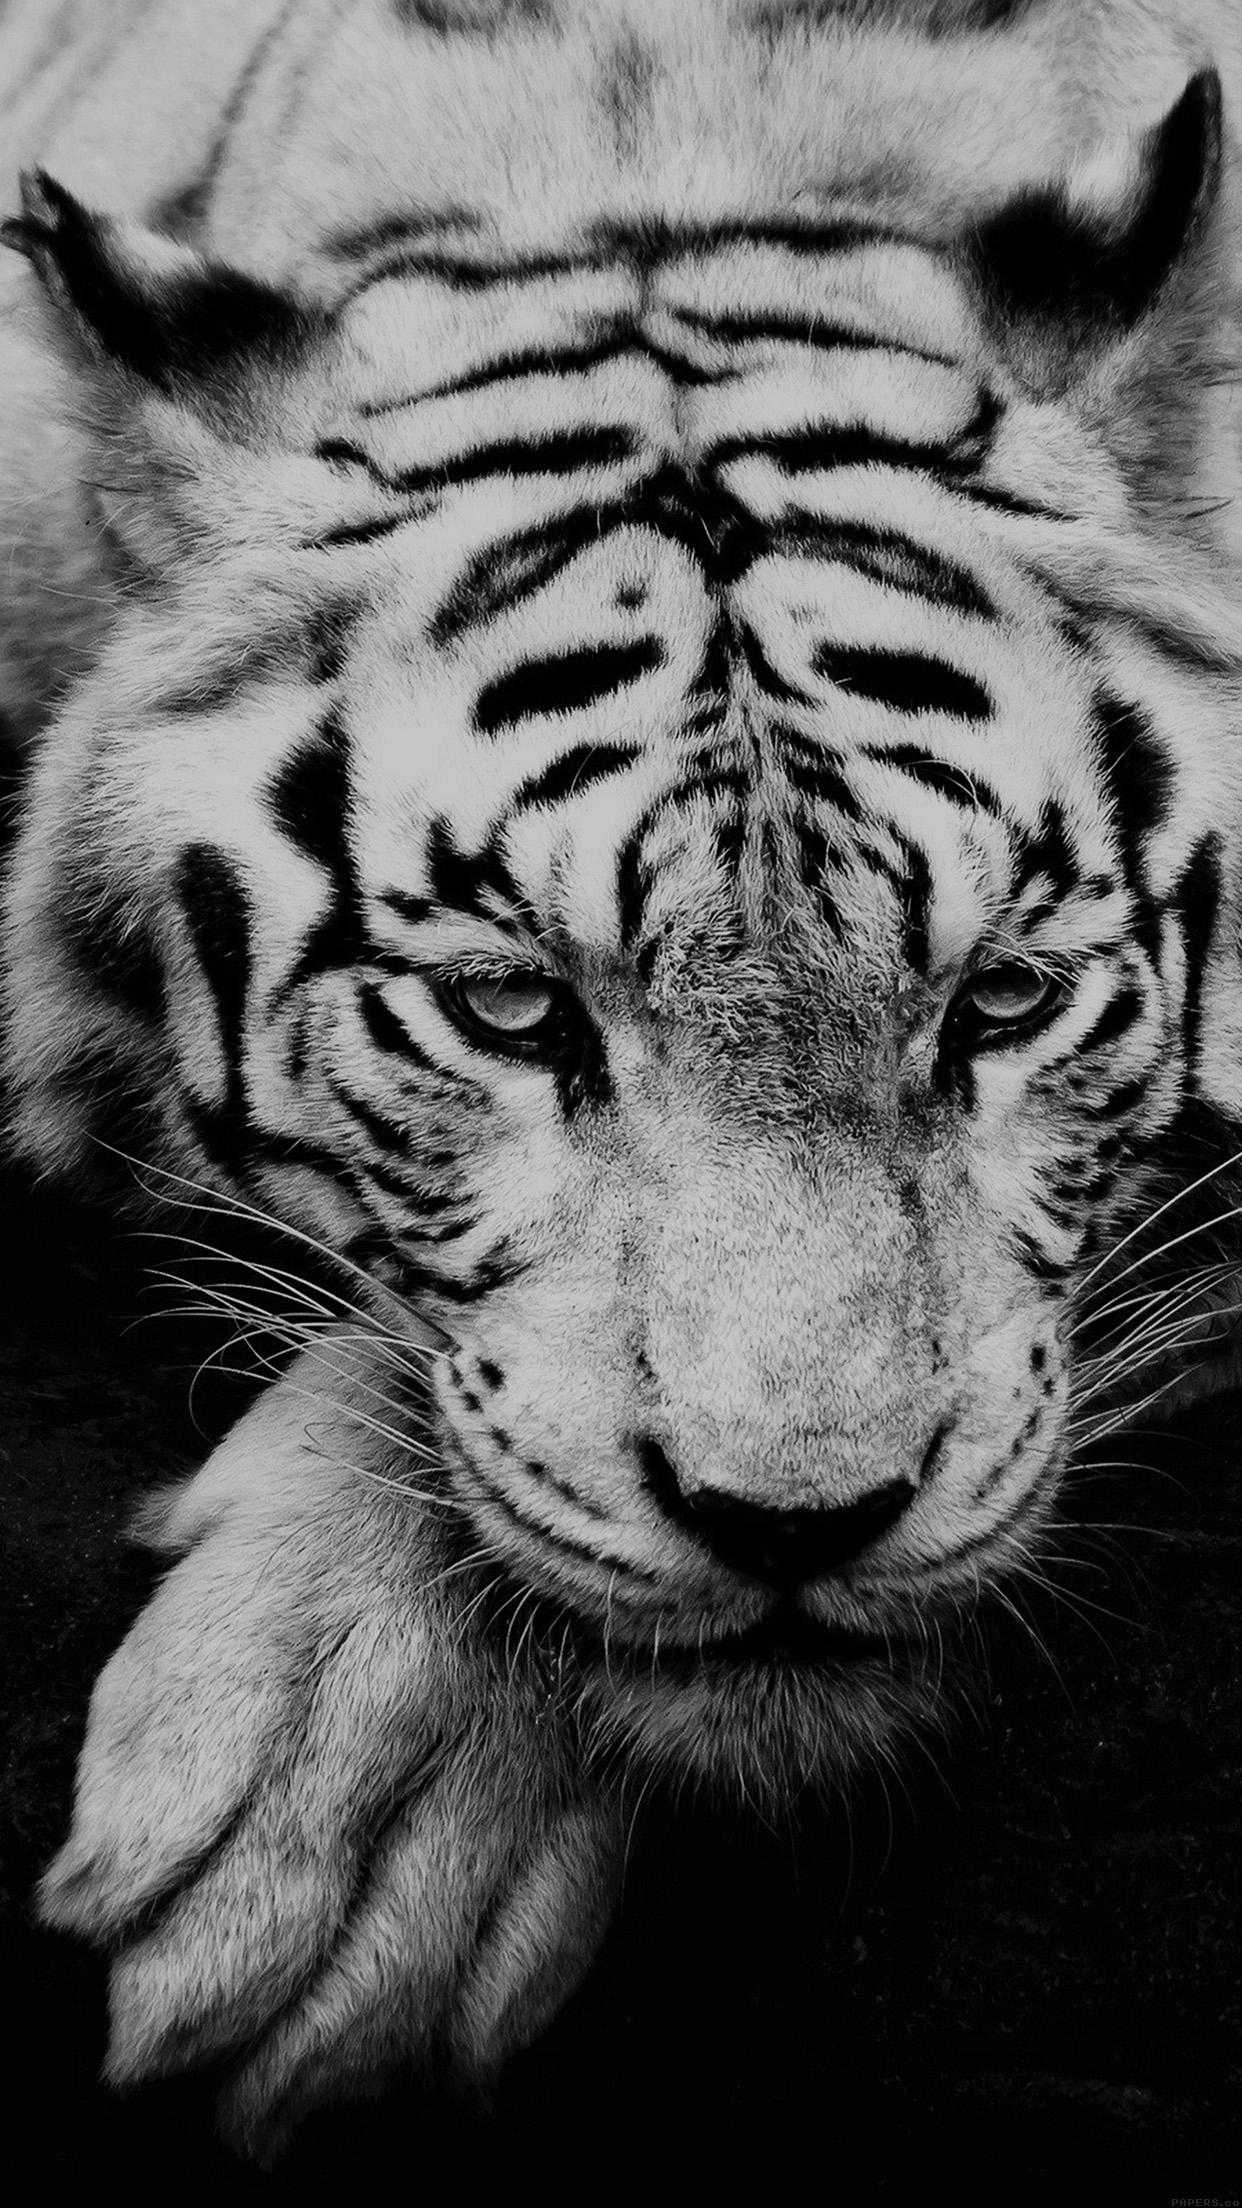 White Siberian Tiger iPhone 6 Plus HD Wallpaper iPod Wallpaper HD 1242x2208